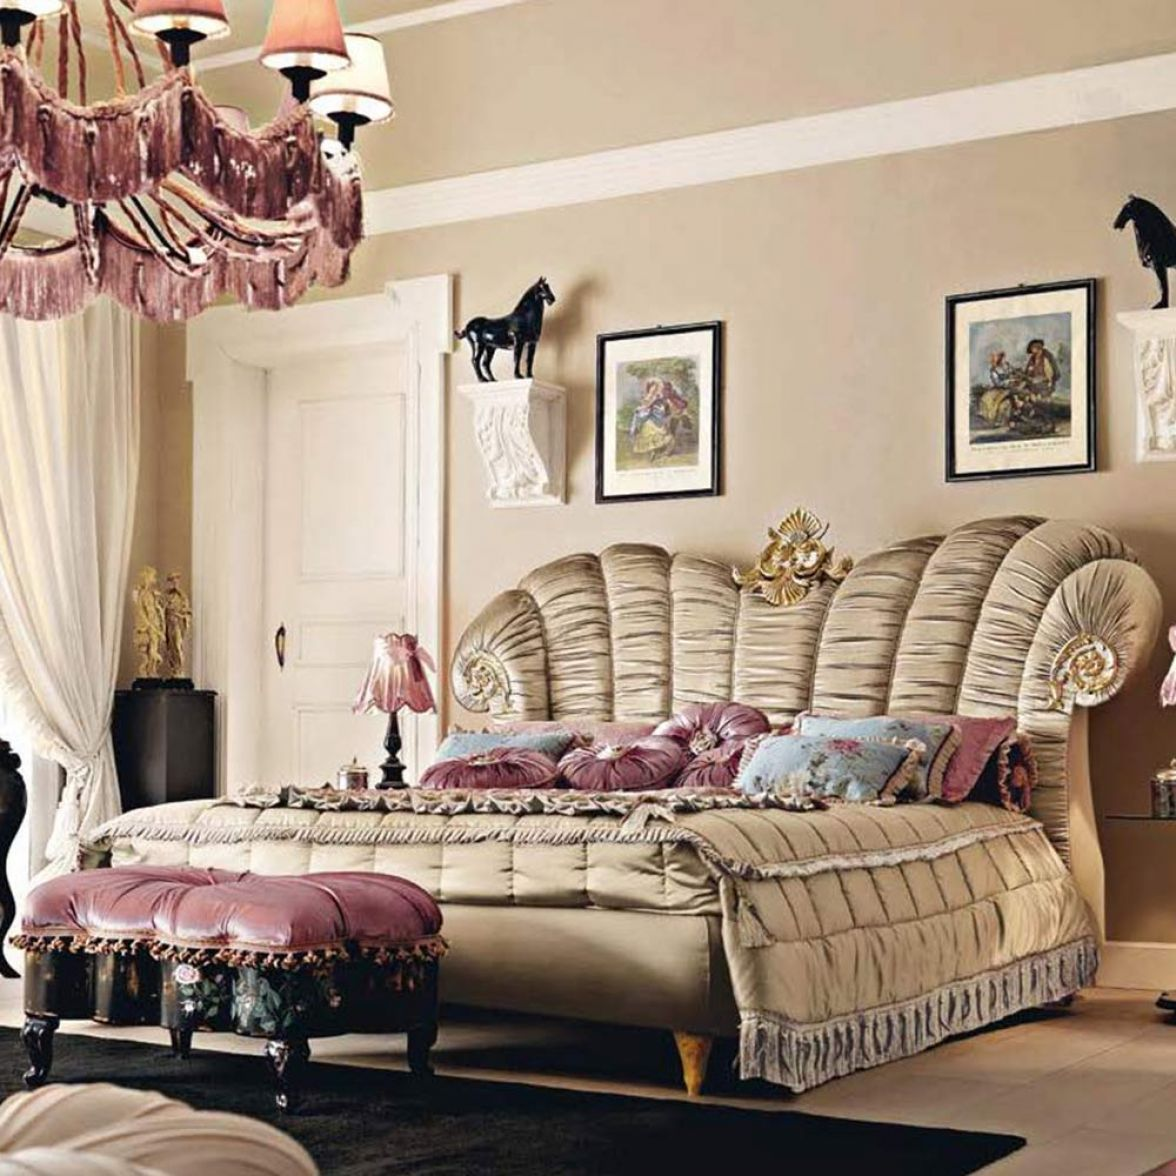 Vip Art bedroom фото цена